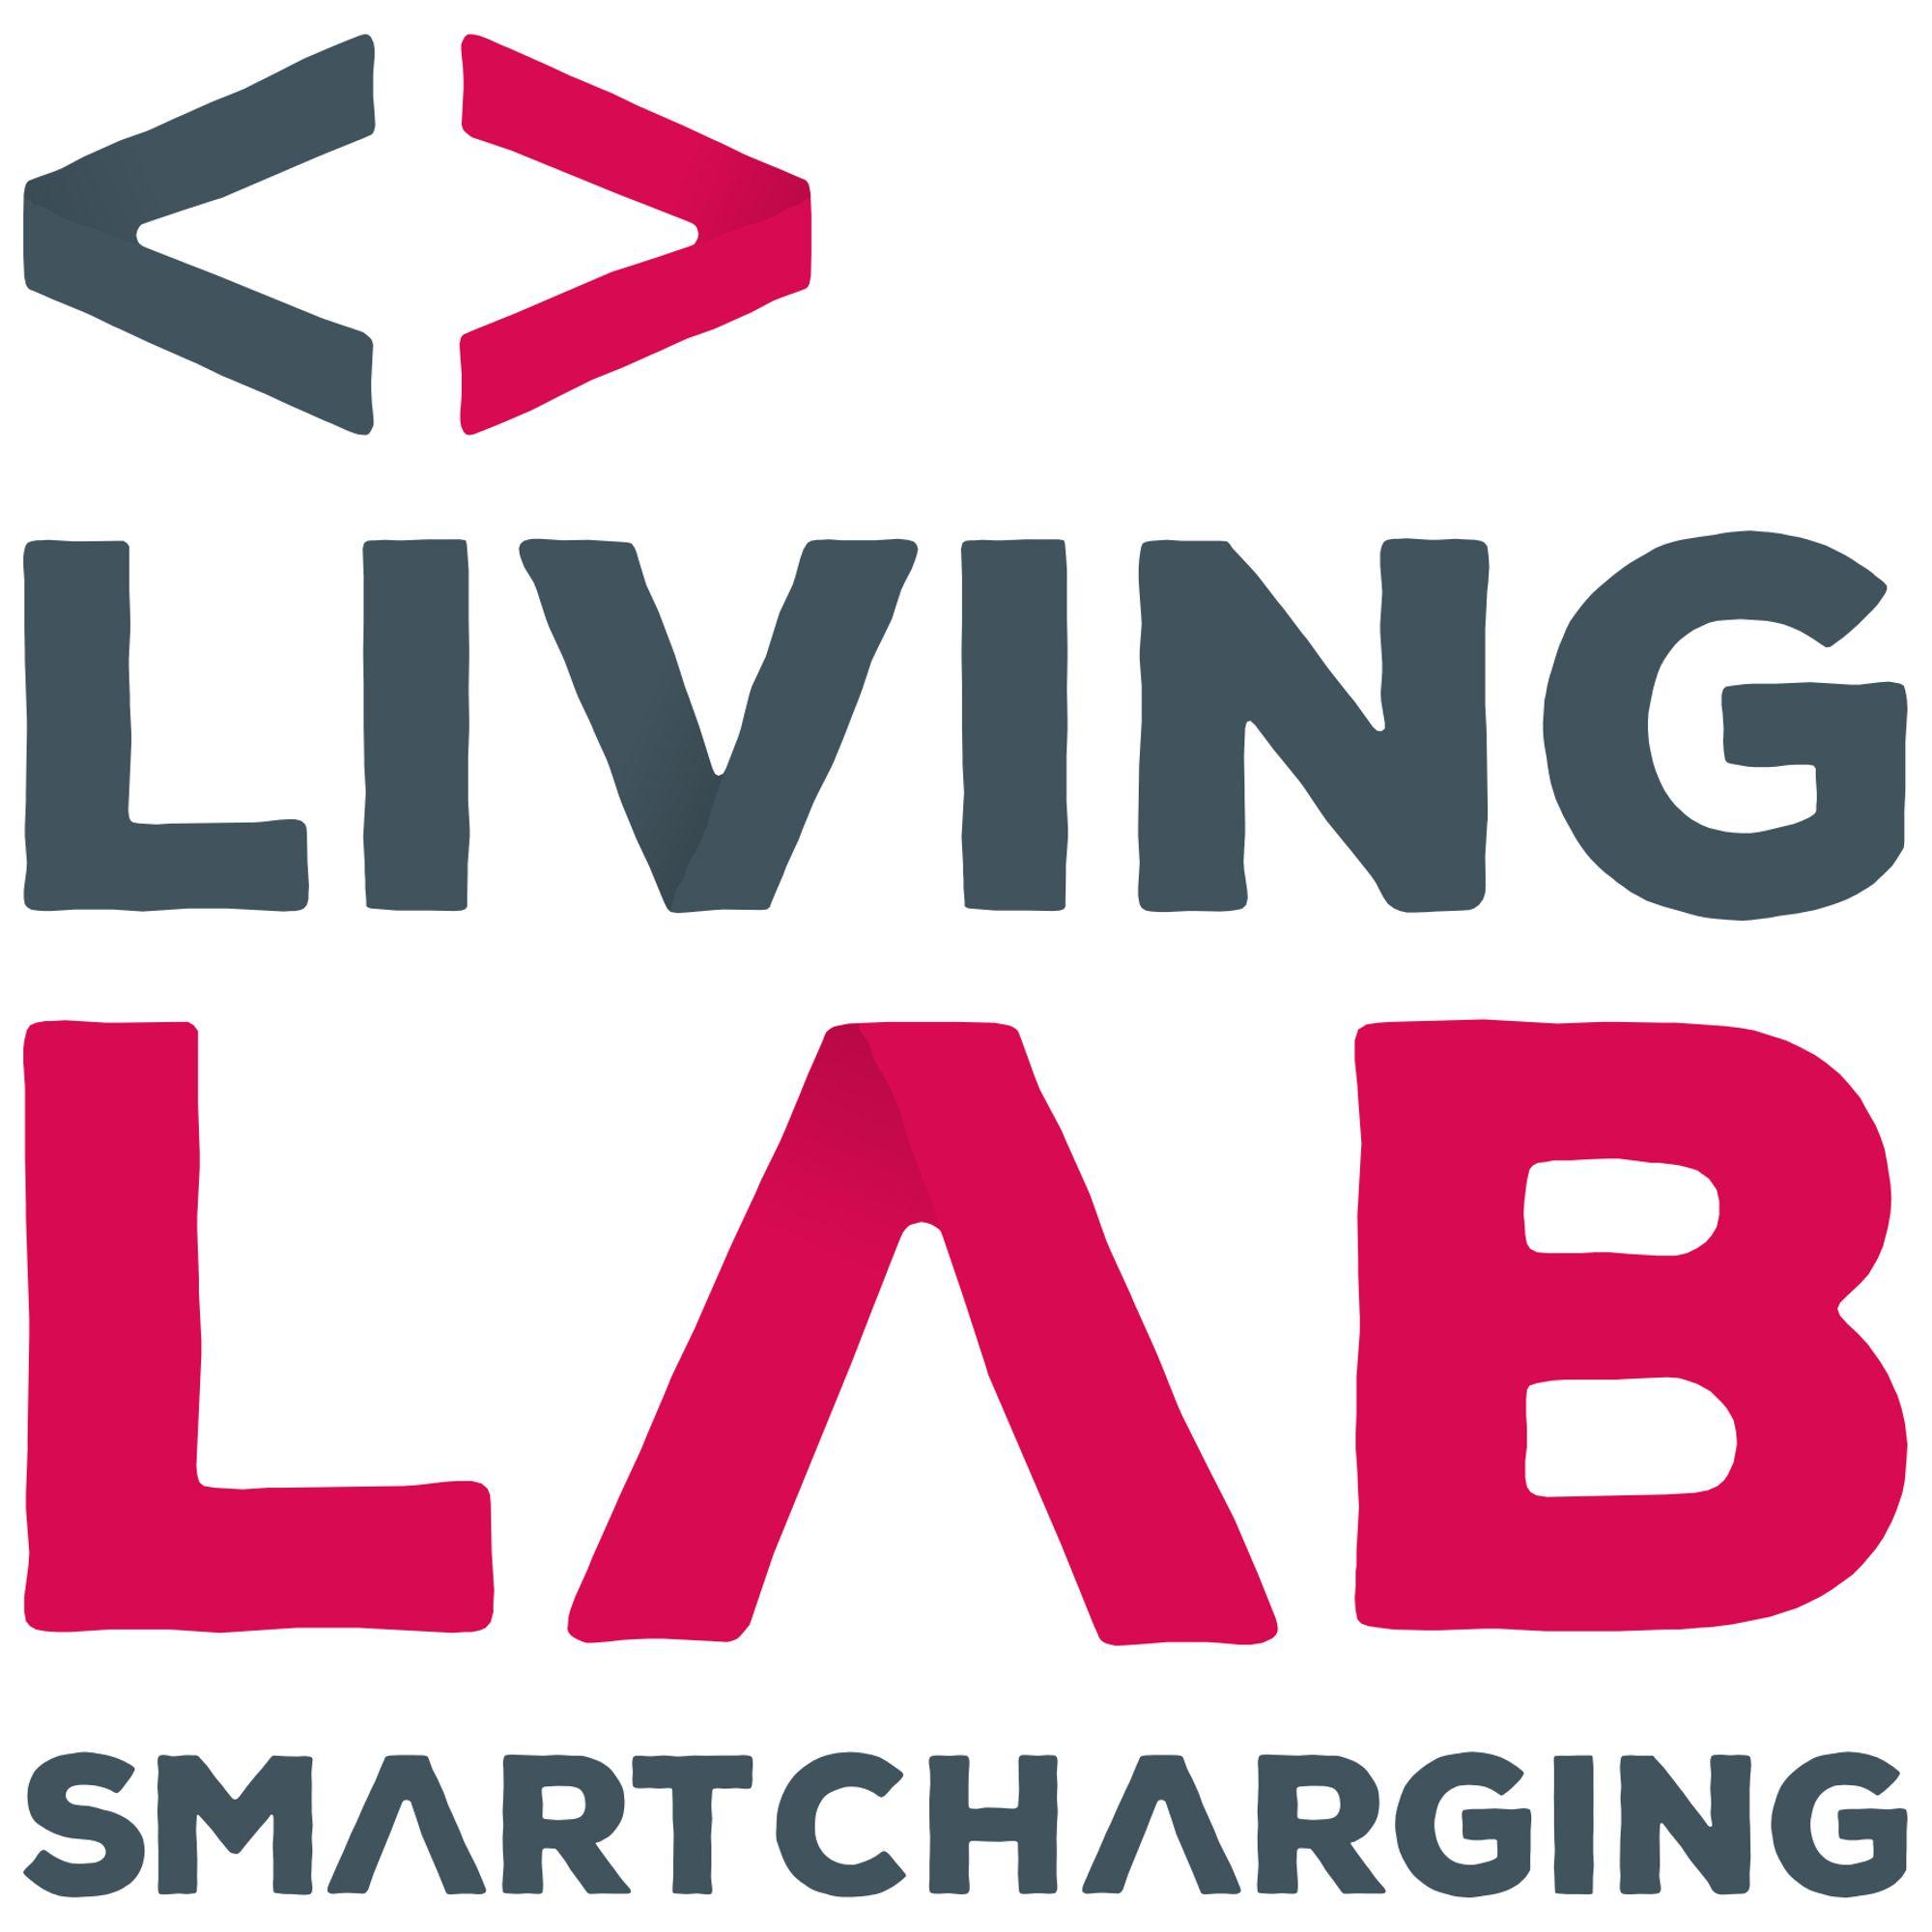 Livinglabsmartcharging